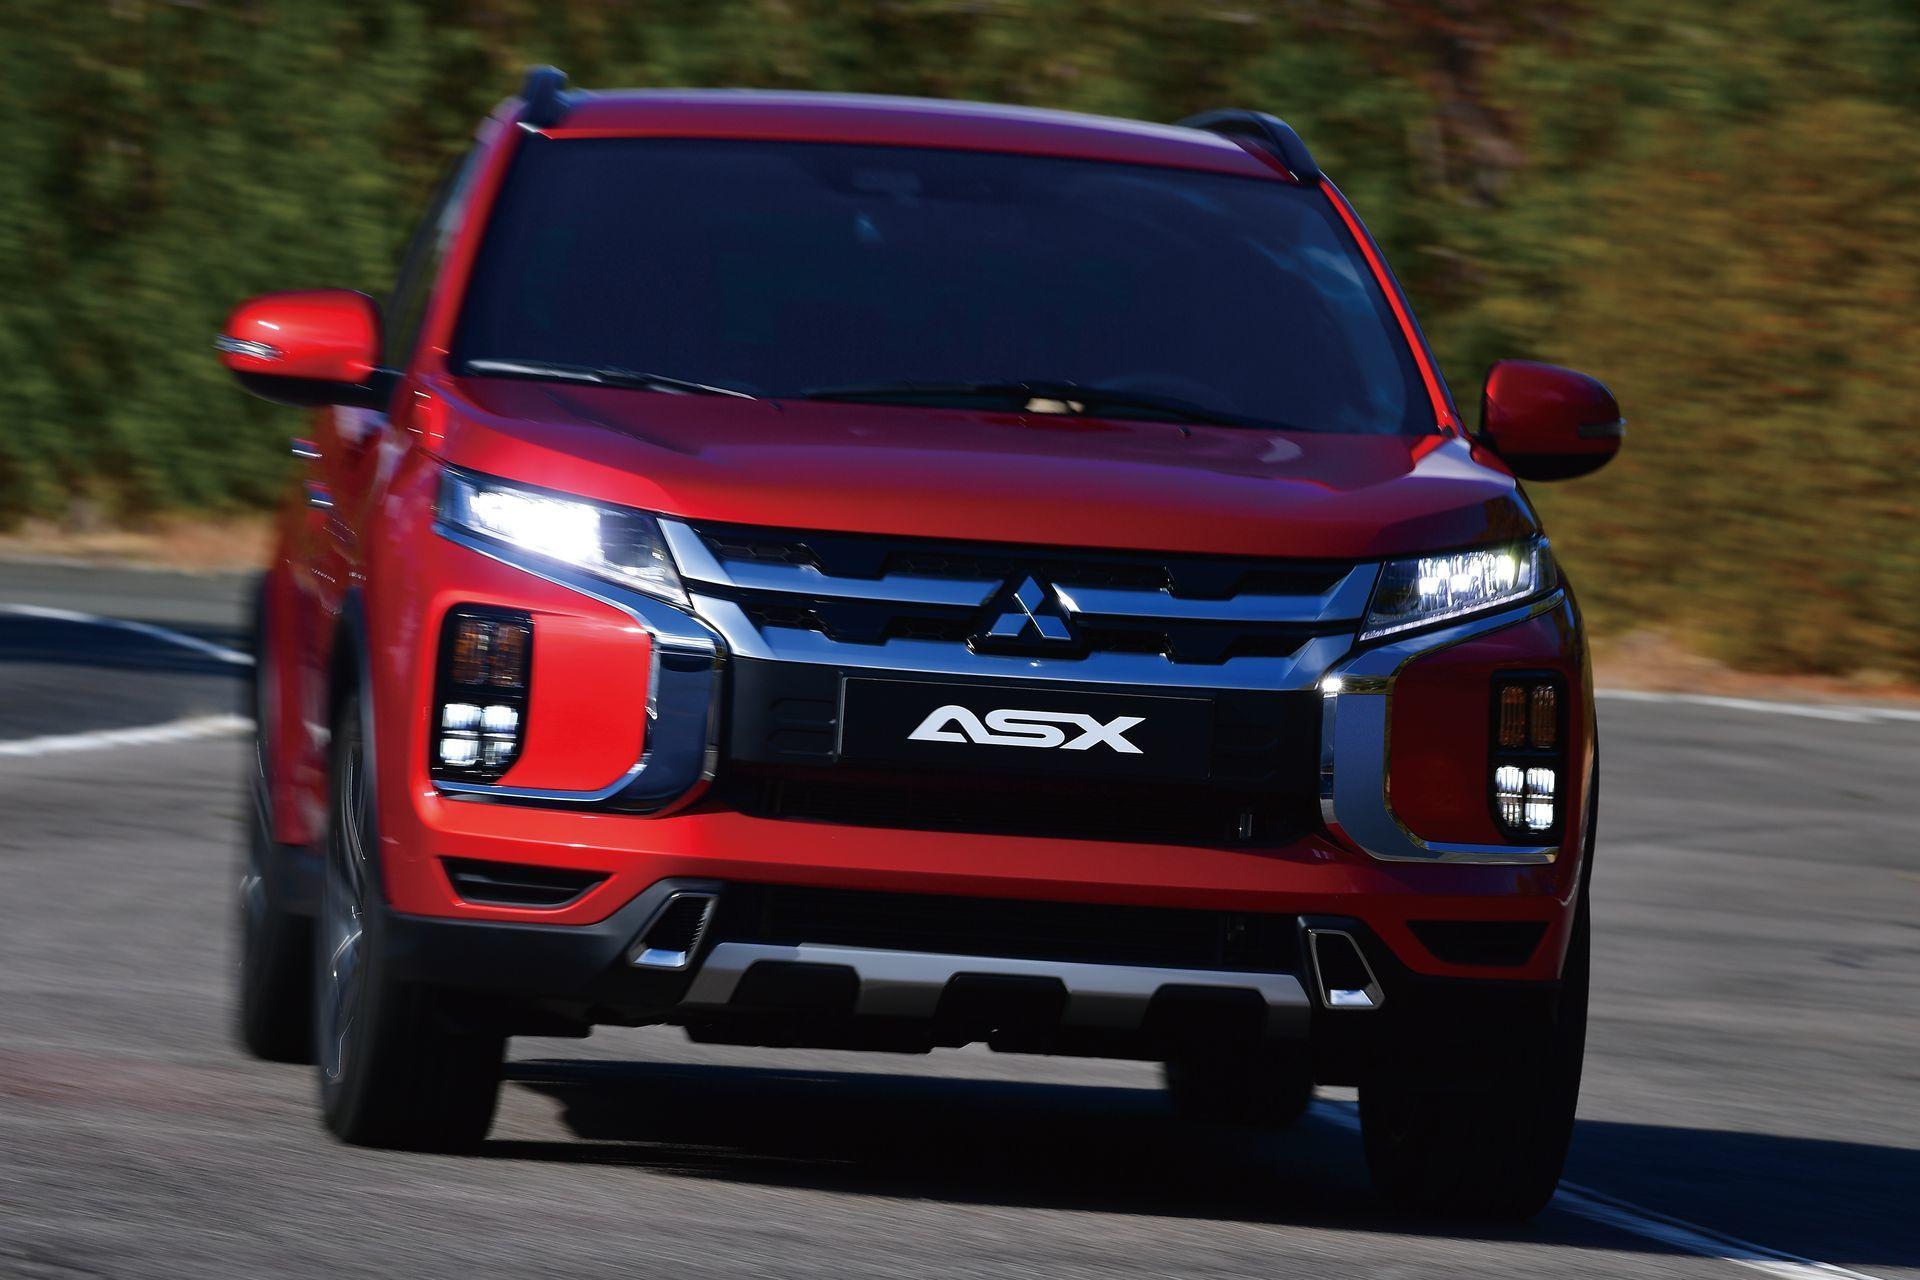 Mitsubishi Asx 2019 8